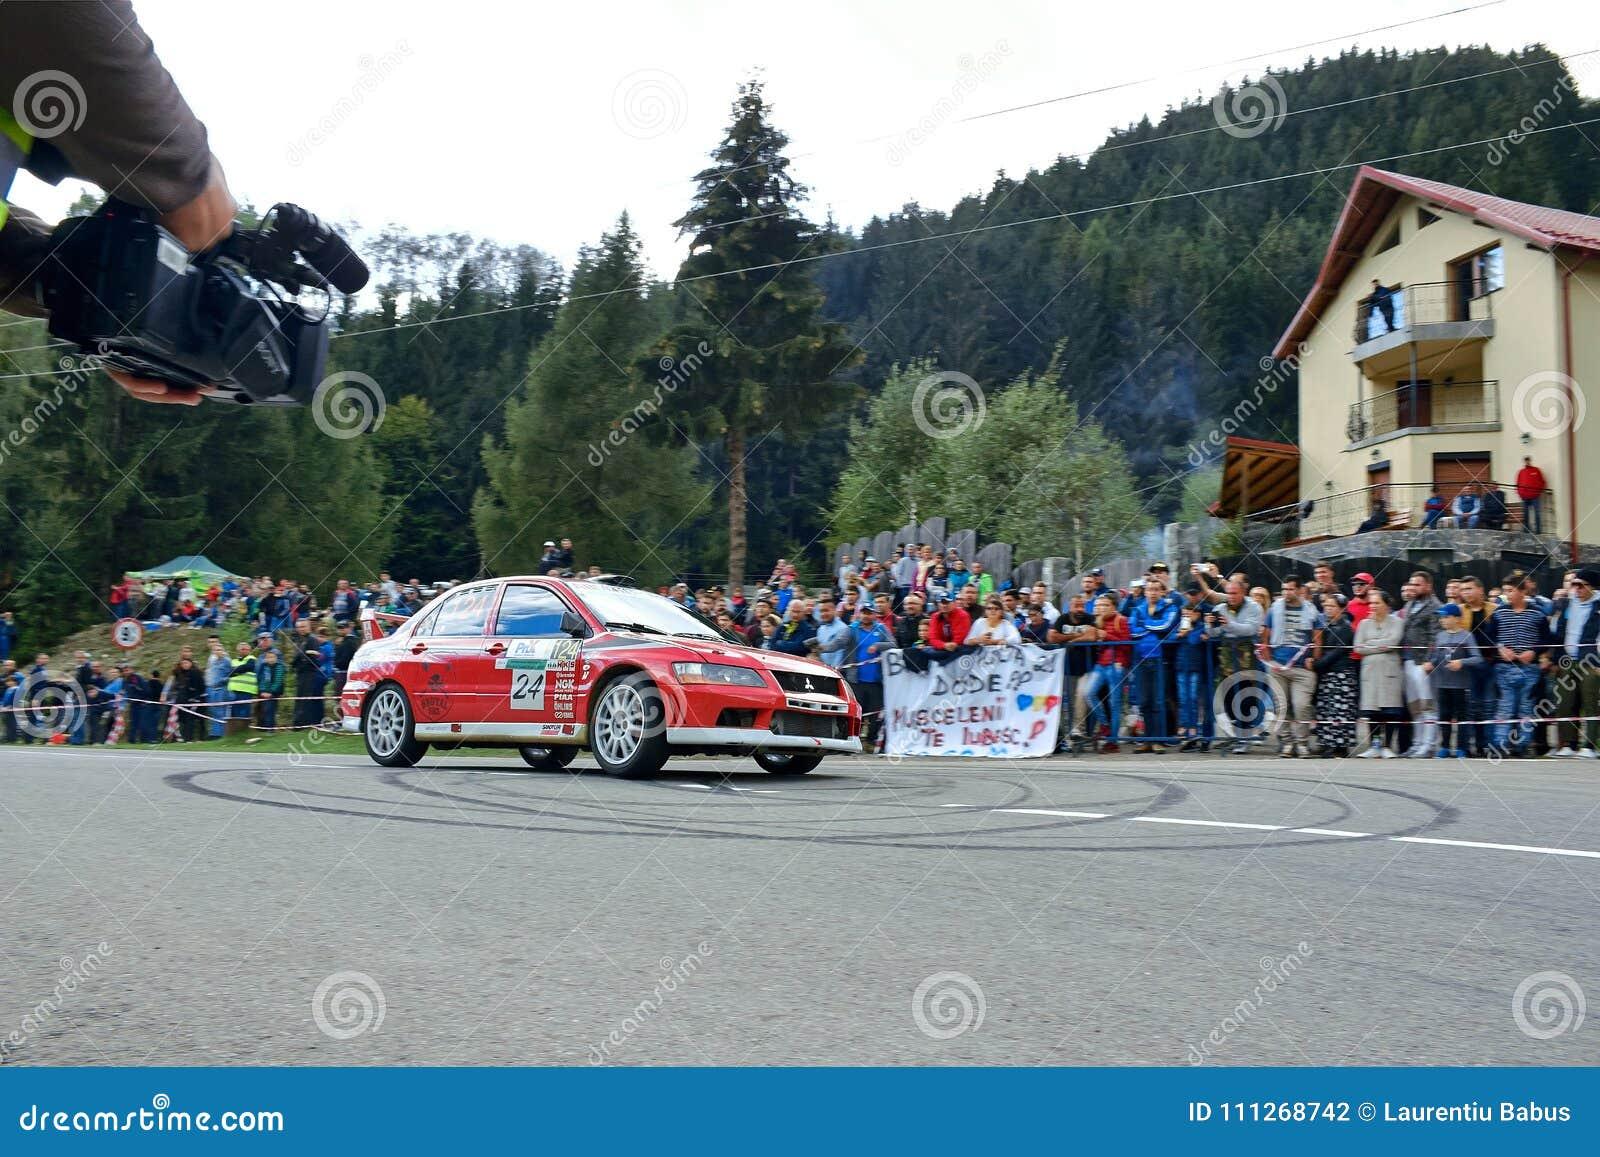 Mitsubishi Lancer Evo Viii Tuning Rally Car Editorial Photography